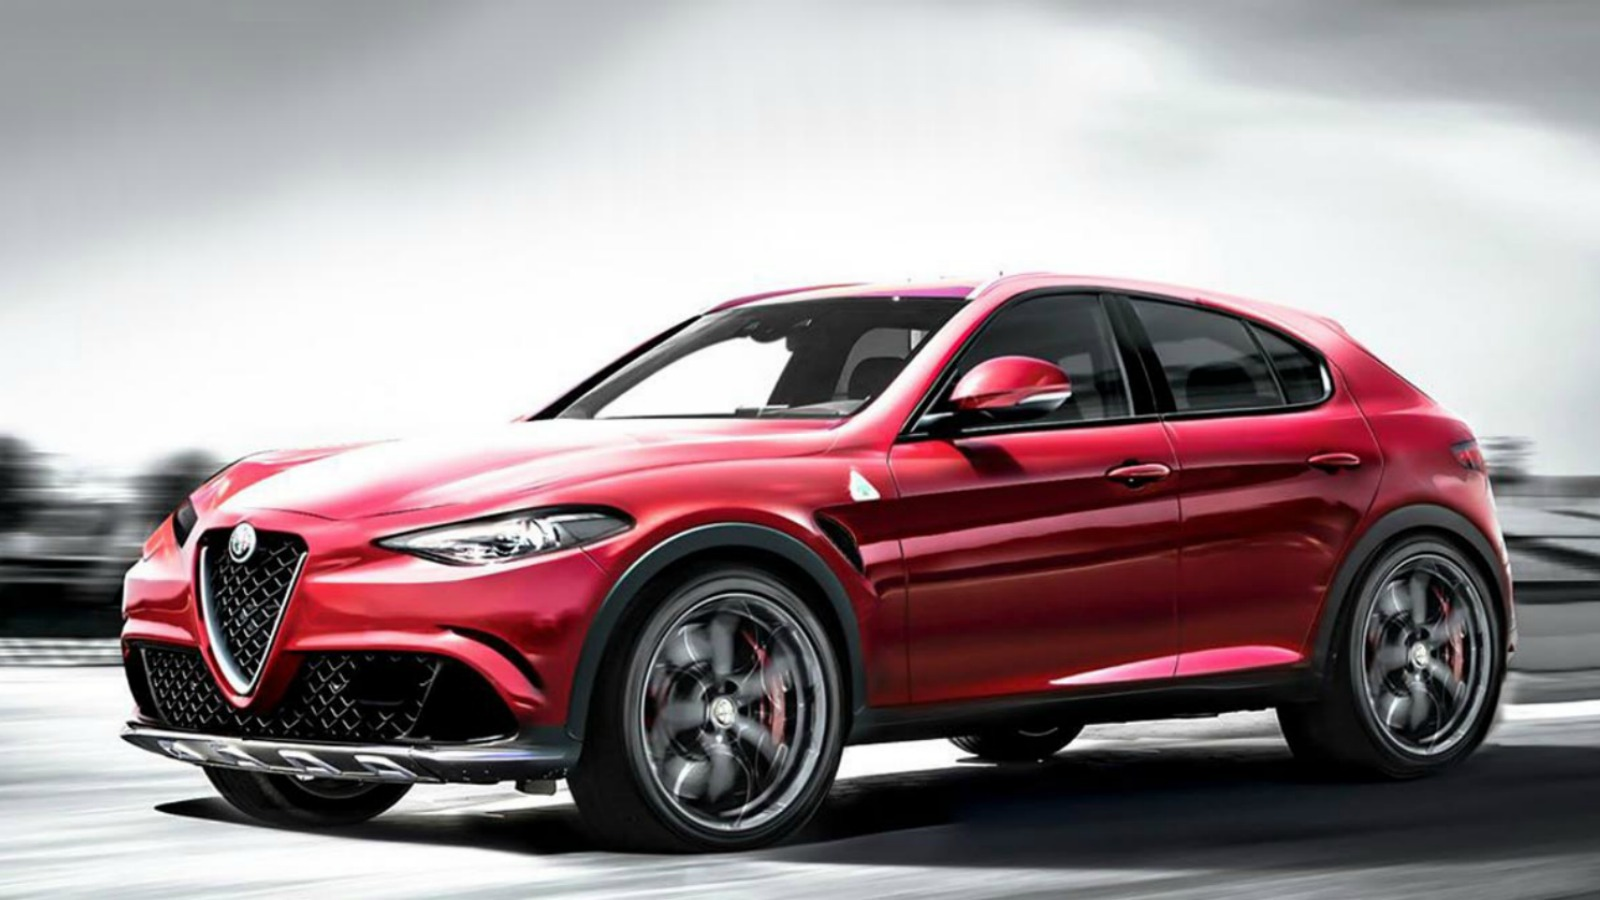 Alfa Romeo SUV render